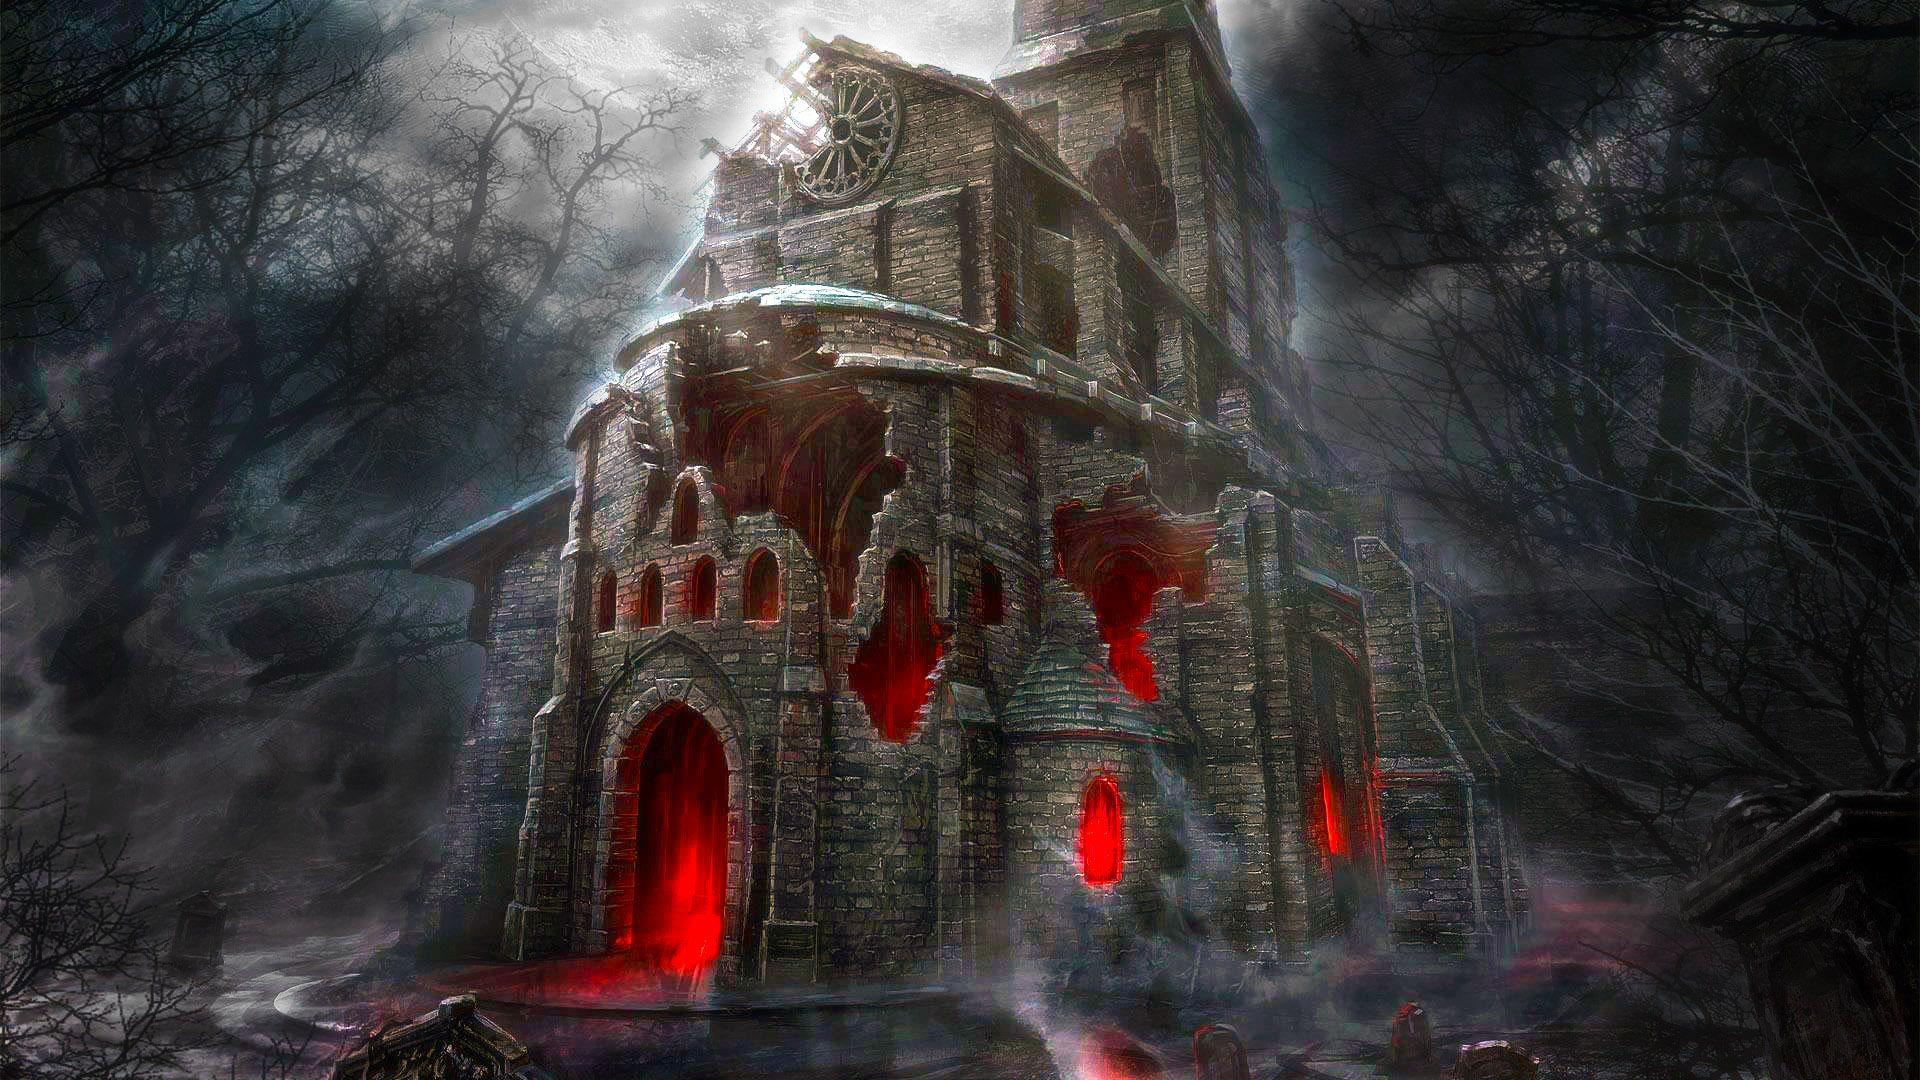 Halloween Horror House Hd Wallpaper Hd Wallpaper For Pc